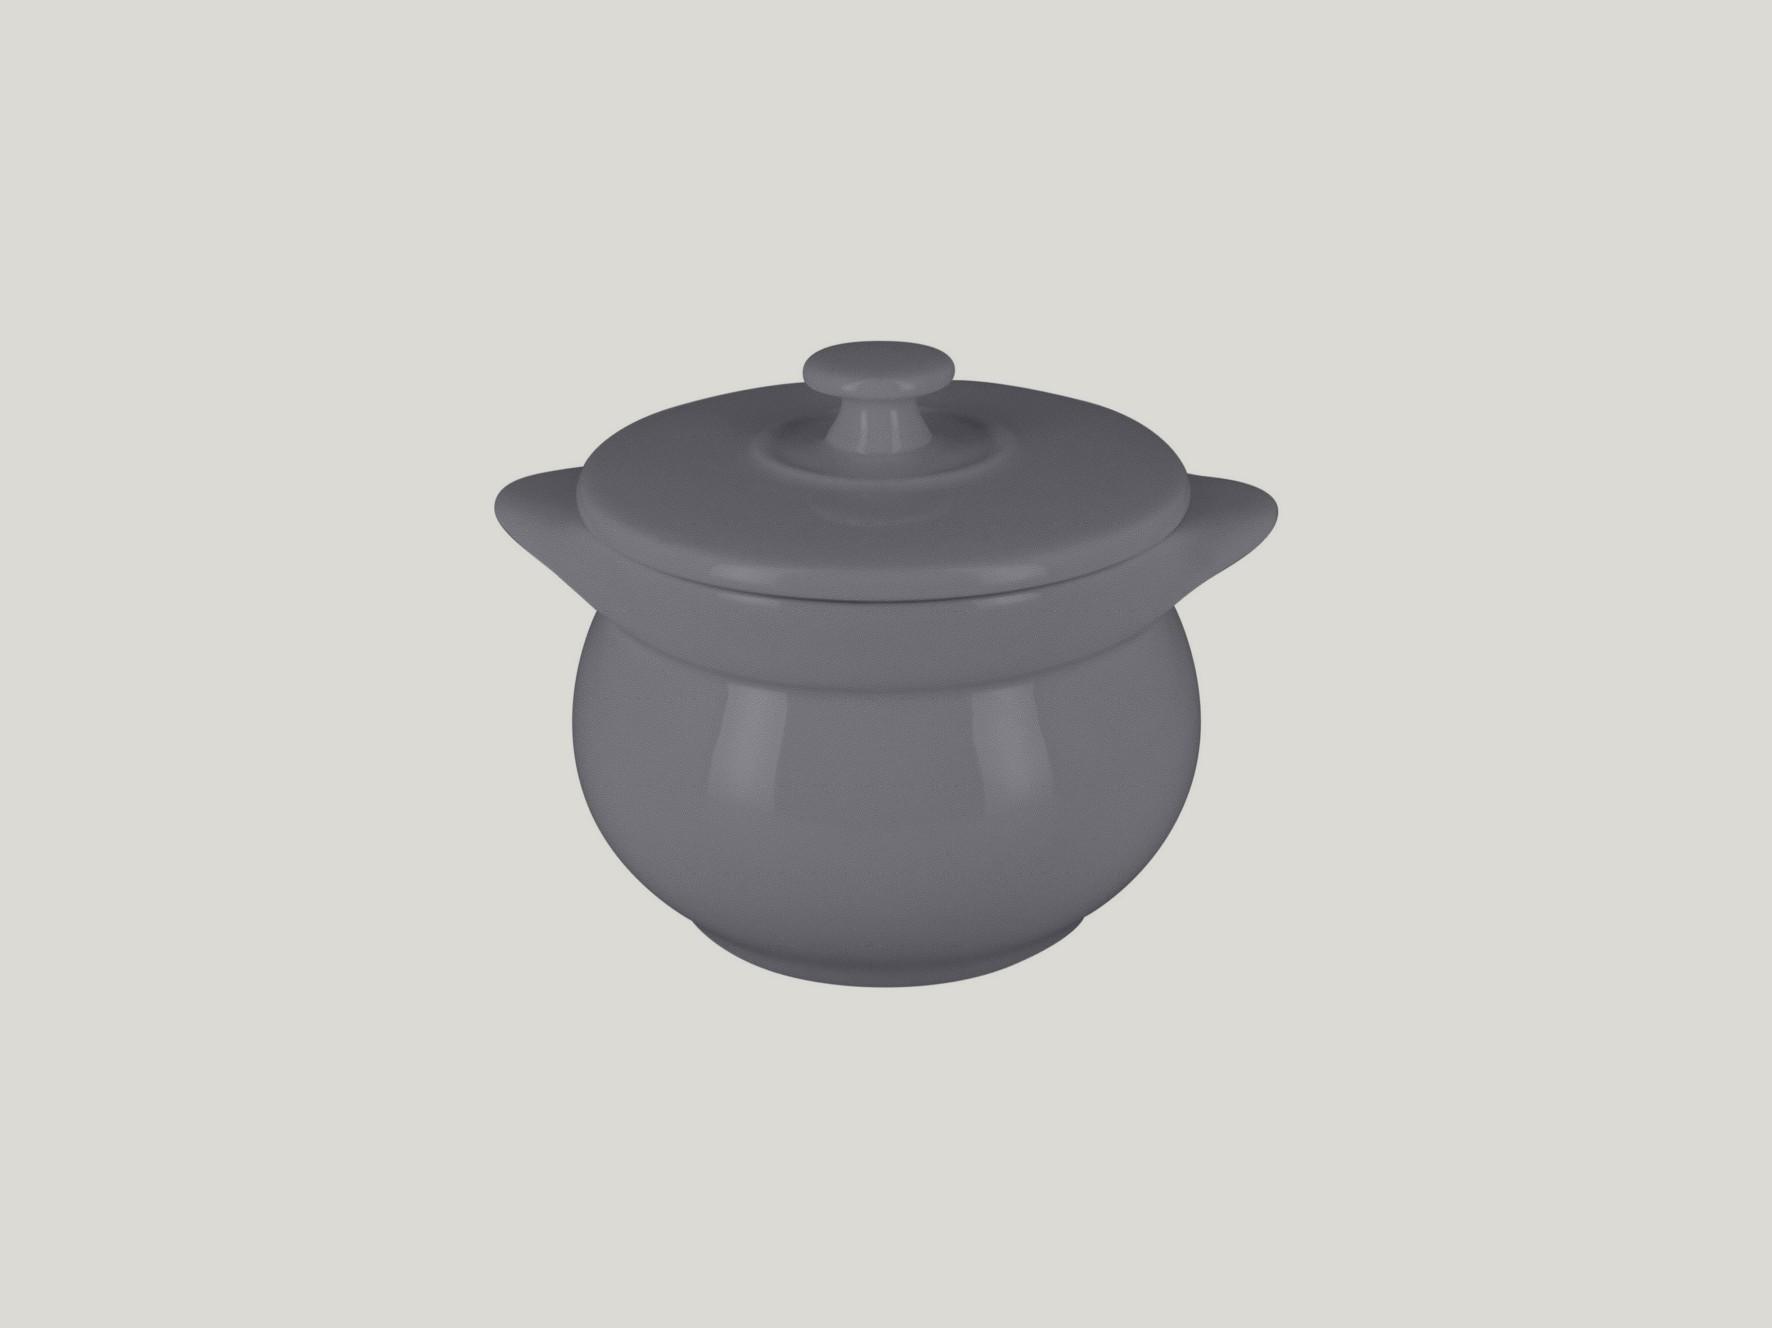 Chefś Fusion mísa na polévku s poklicí šedá